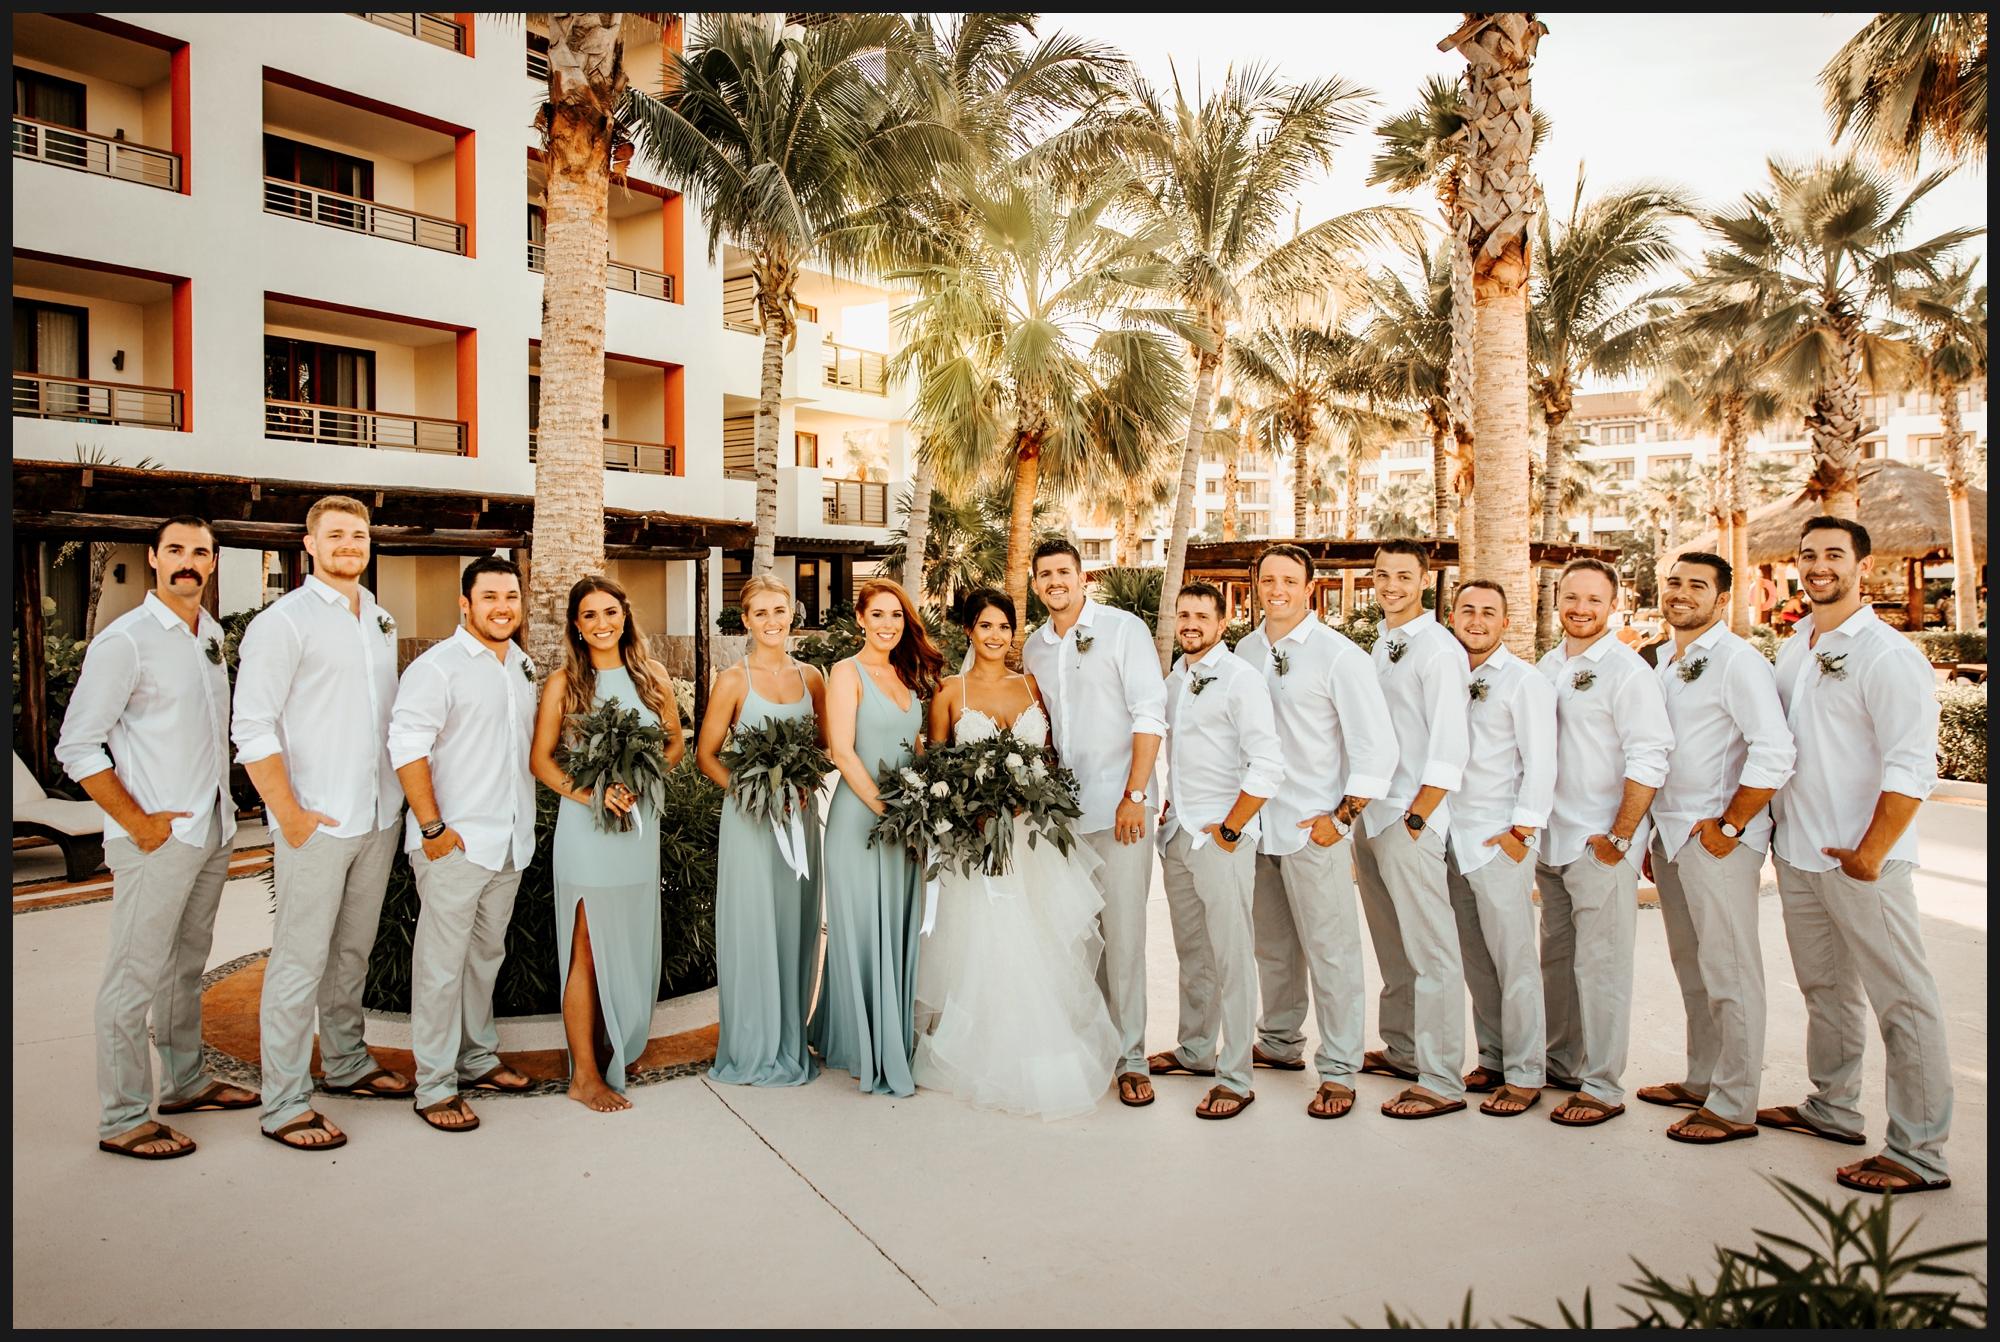 Orlando-Wedding-Photographer-destination-wedding-photographer-florida-wedding-photographer-bohemian-wedding-photographer_0509.jpg